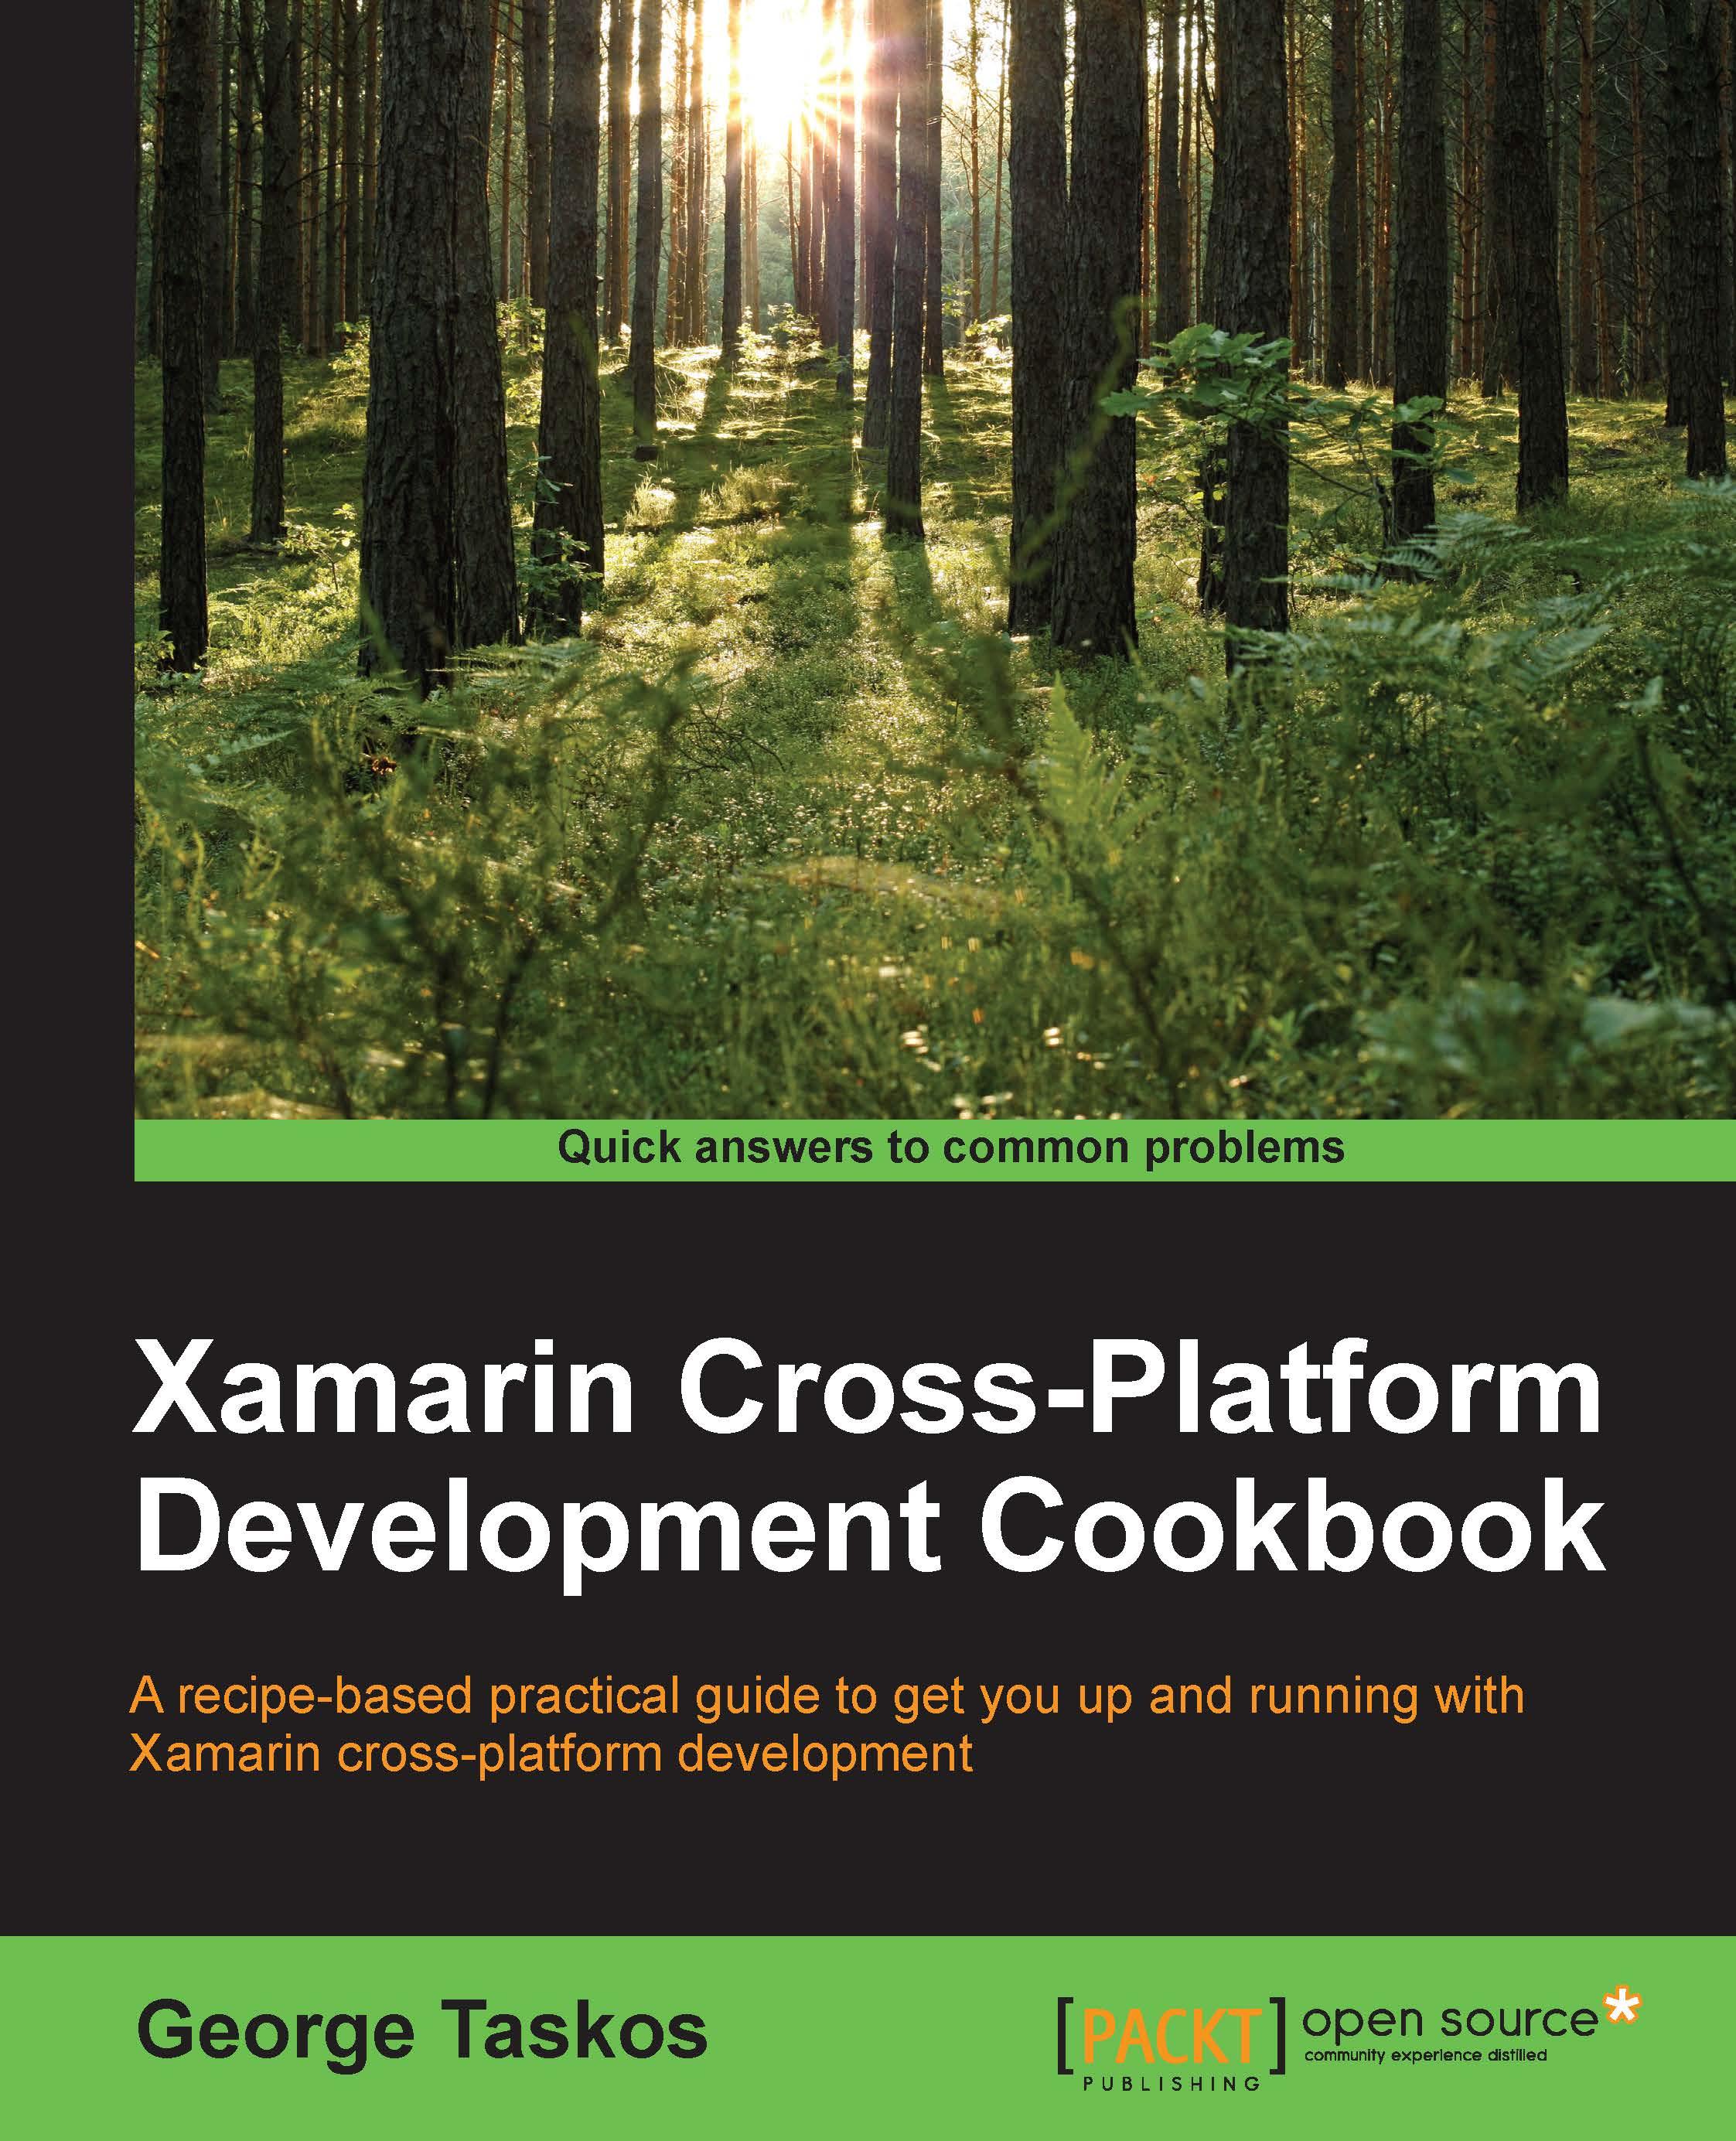 Xamarin Cross-Platform Development Cookbook (1st Edition)